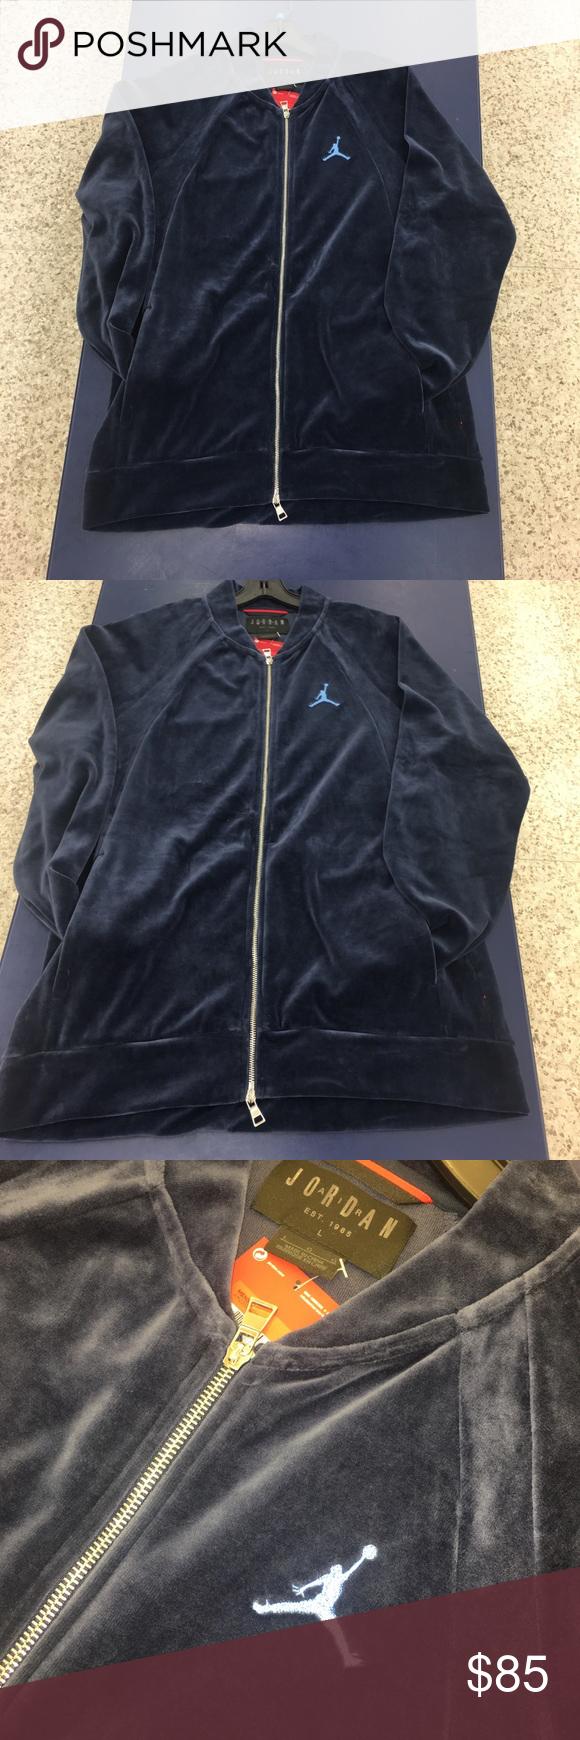 94995b51c15db0 Air Jordan Velour Jacket Blue Sky Blue Black Large Air Jordan Velour Jacket  Brand New With